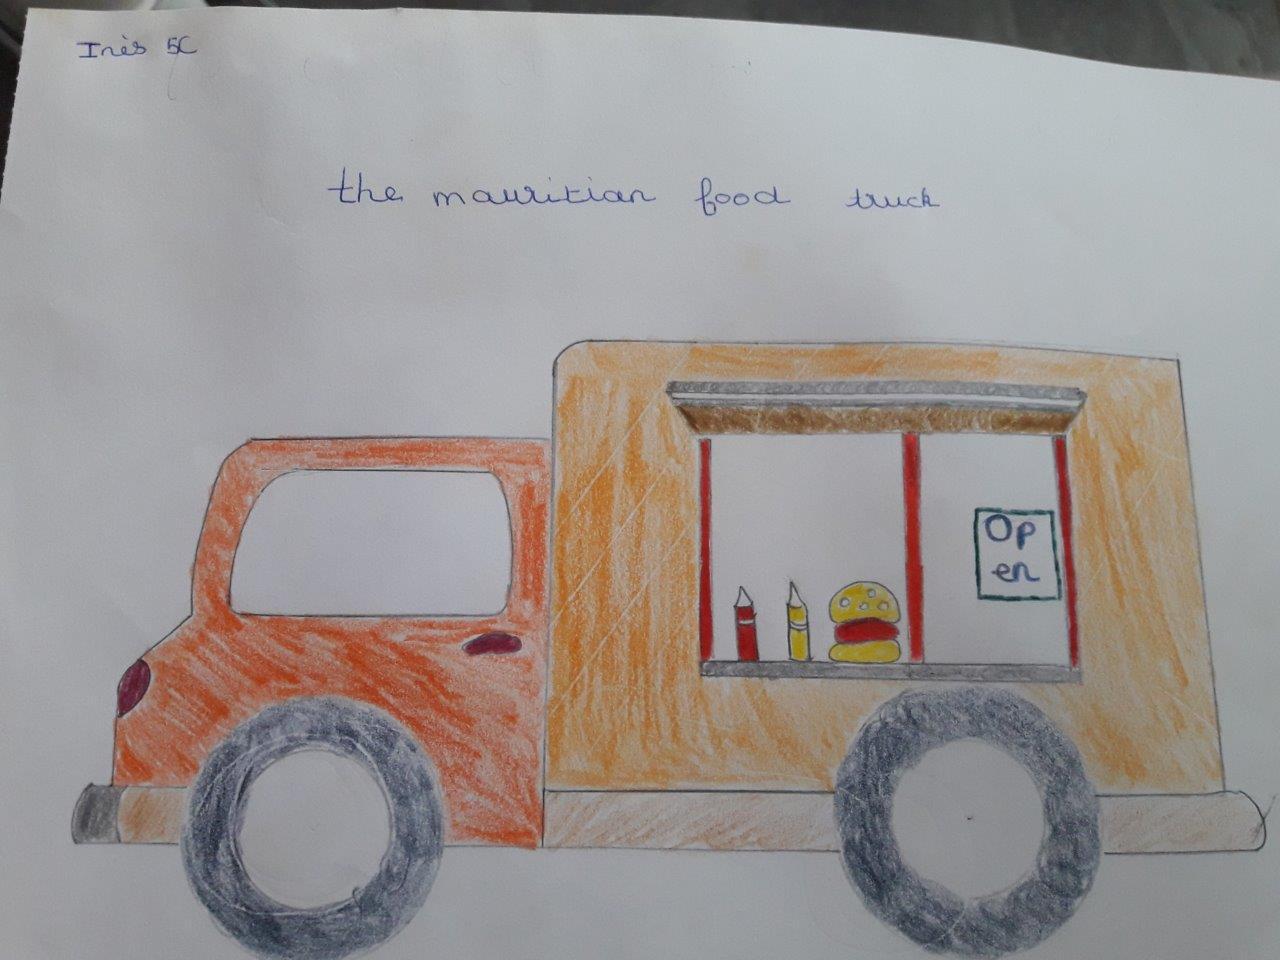 2020-05-my-food-truck (10)